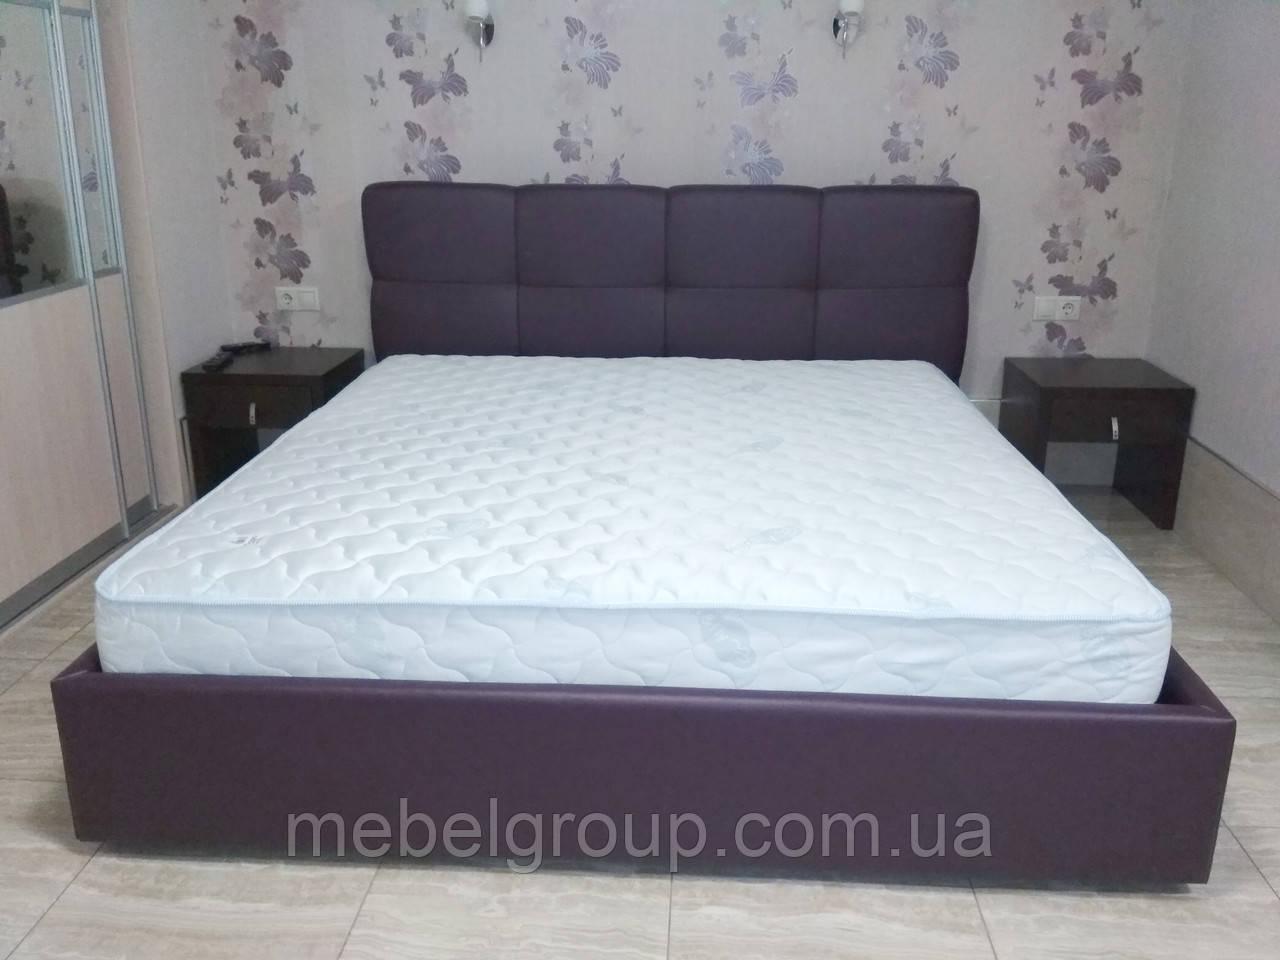 Ліжко Мілея 180*200, з механізмом